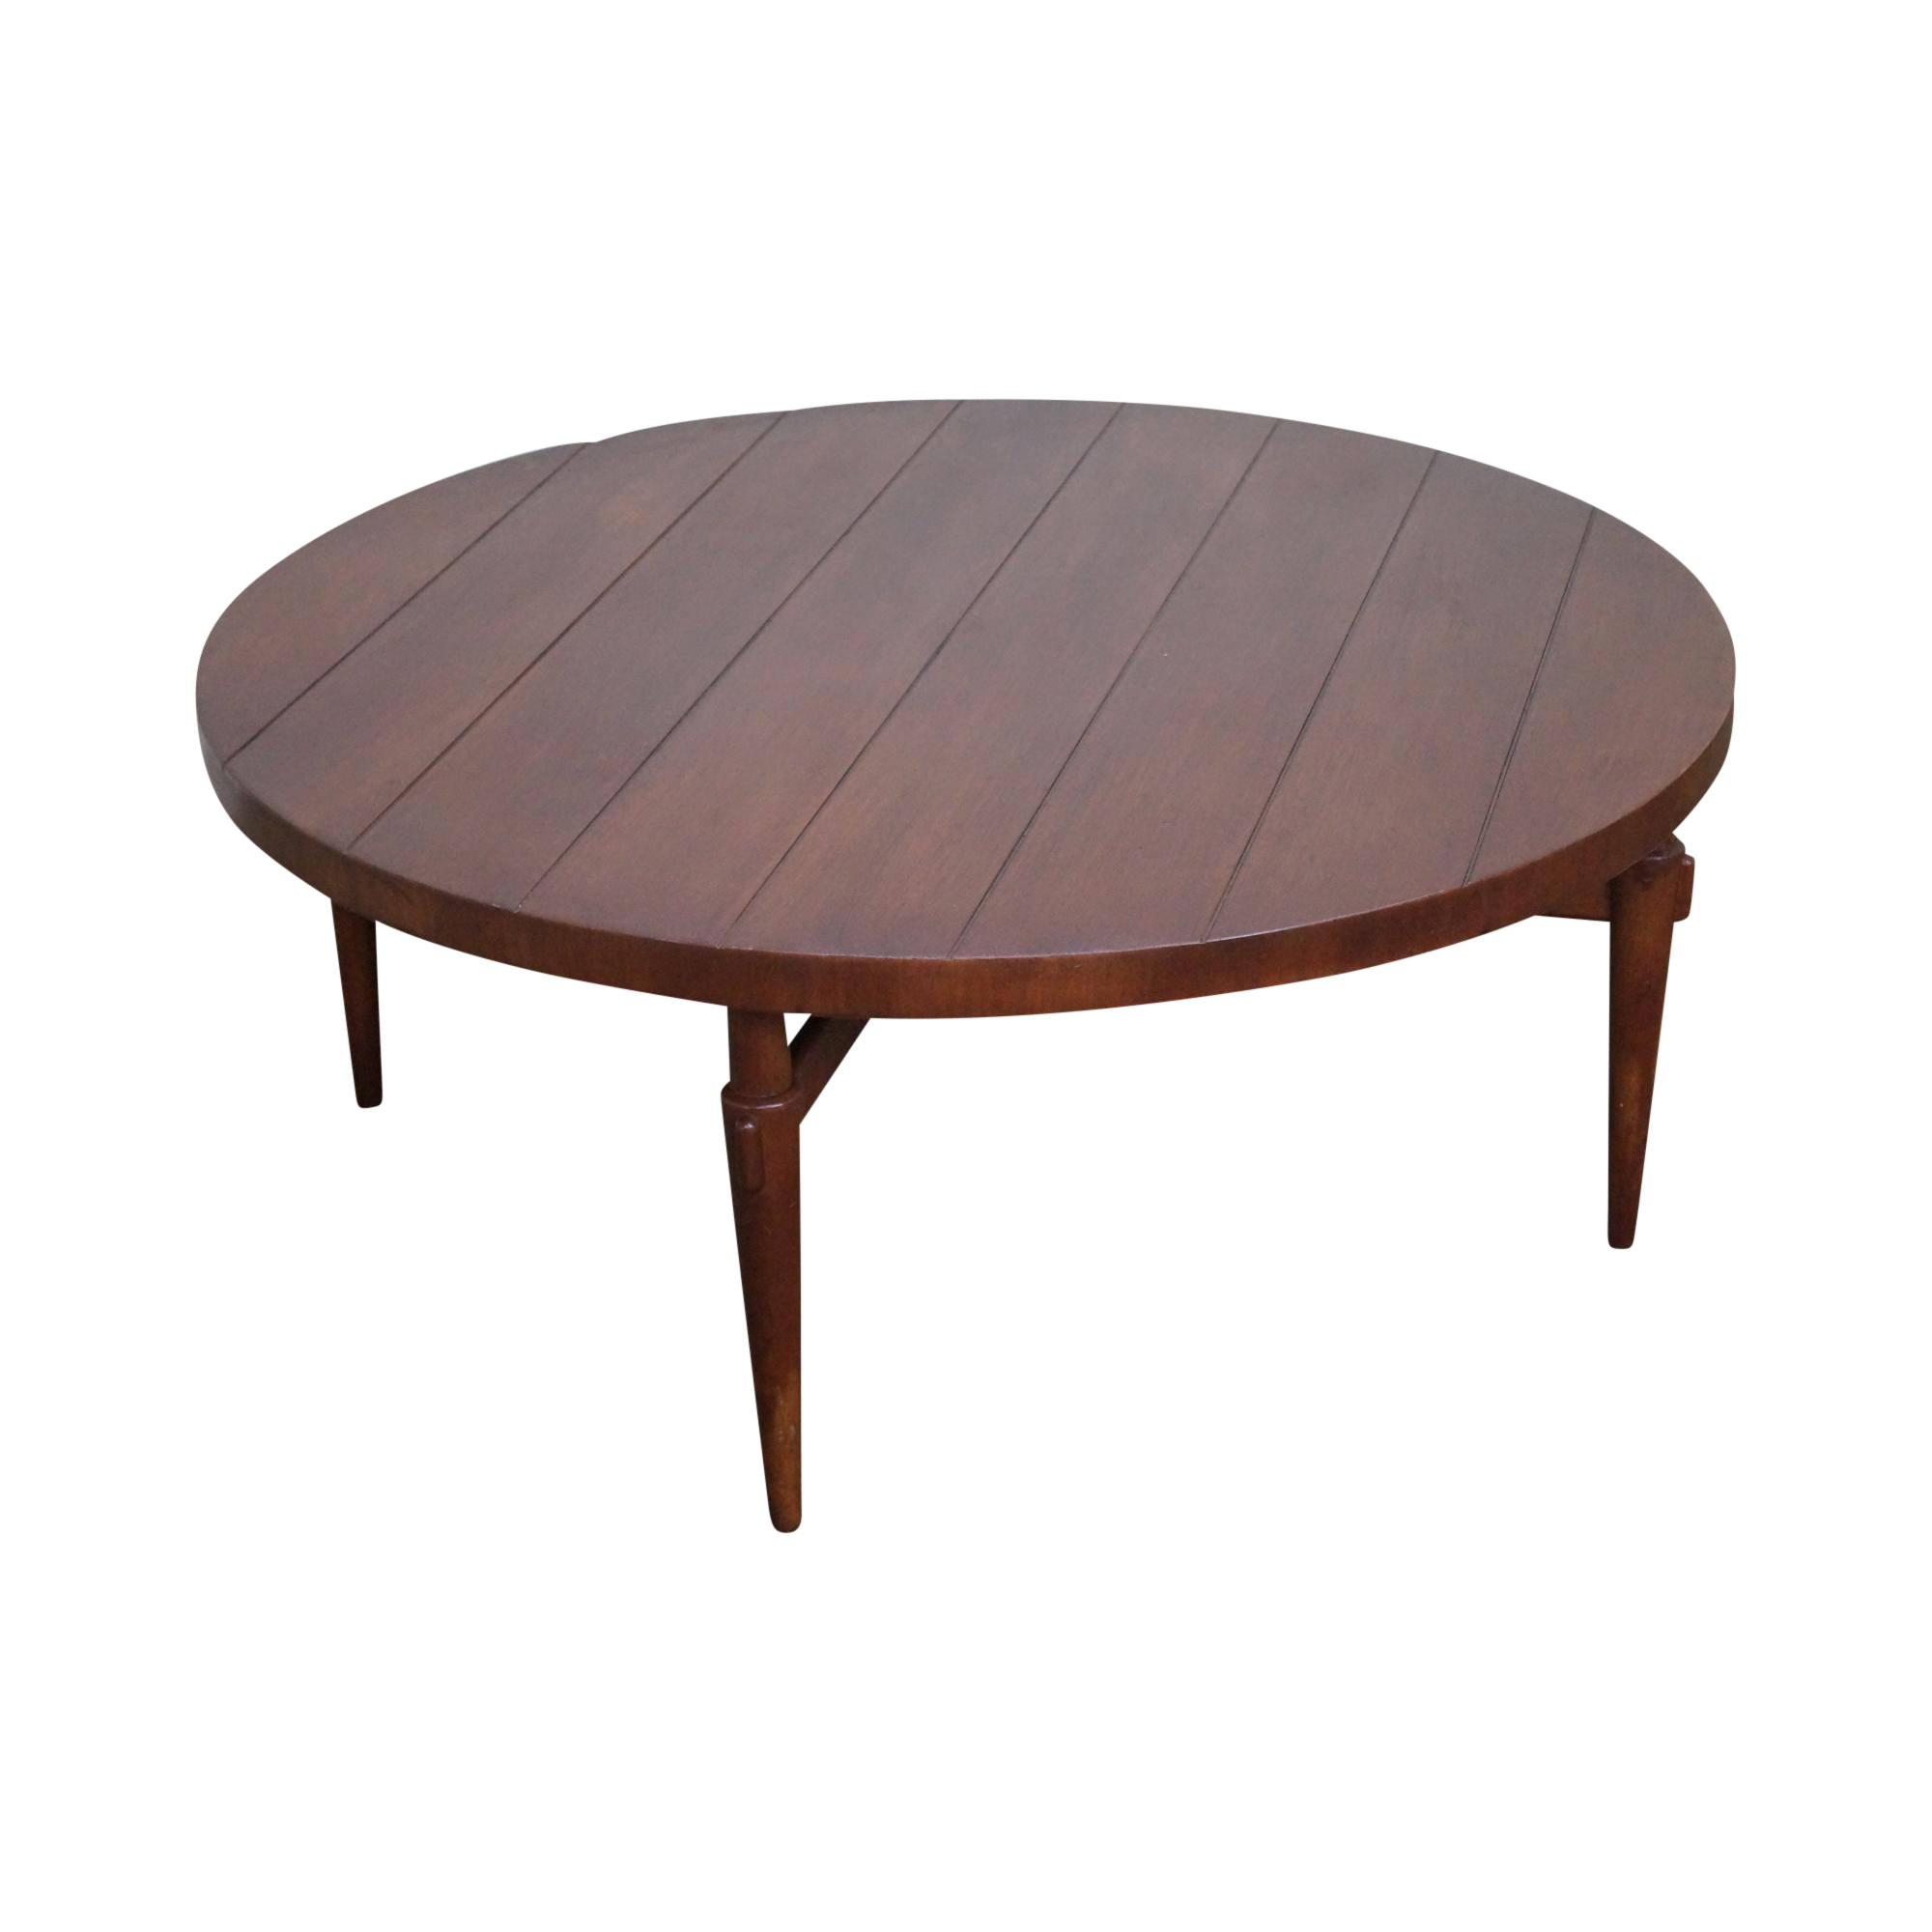 Mid Century Modern Round Coffee Tables: Lane Mid-Century Modern Round Coffee Table